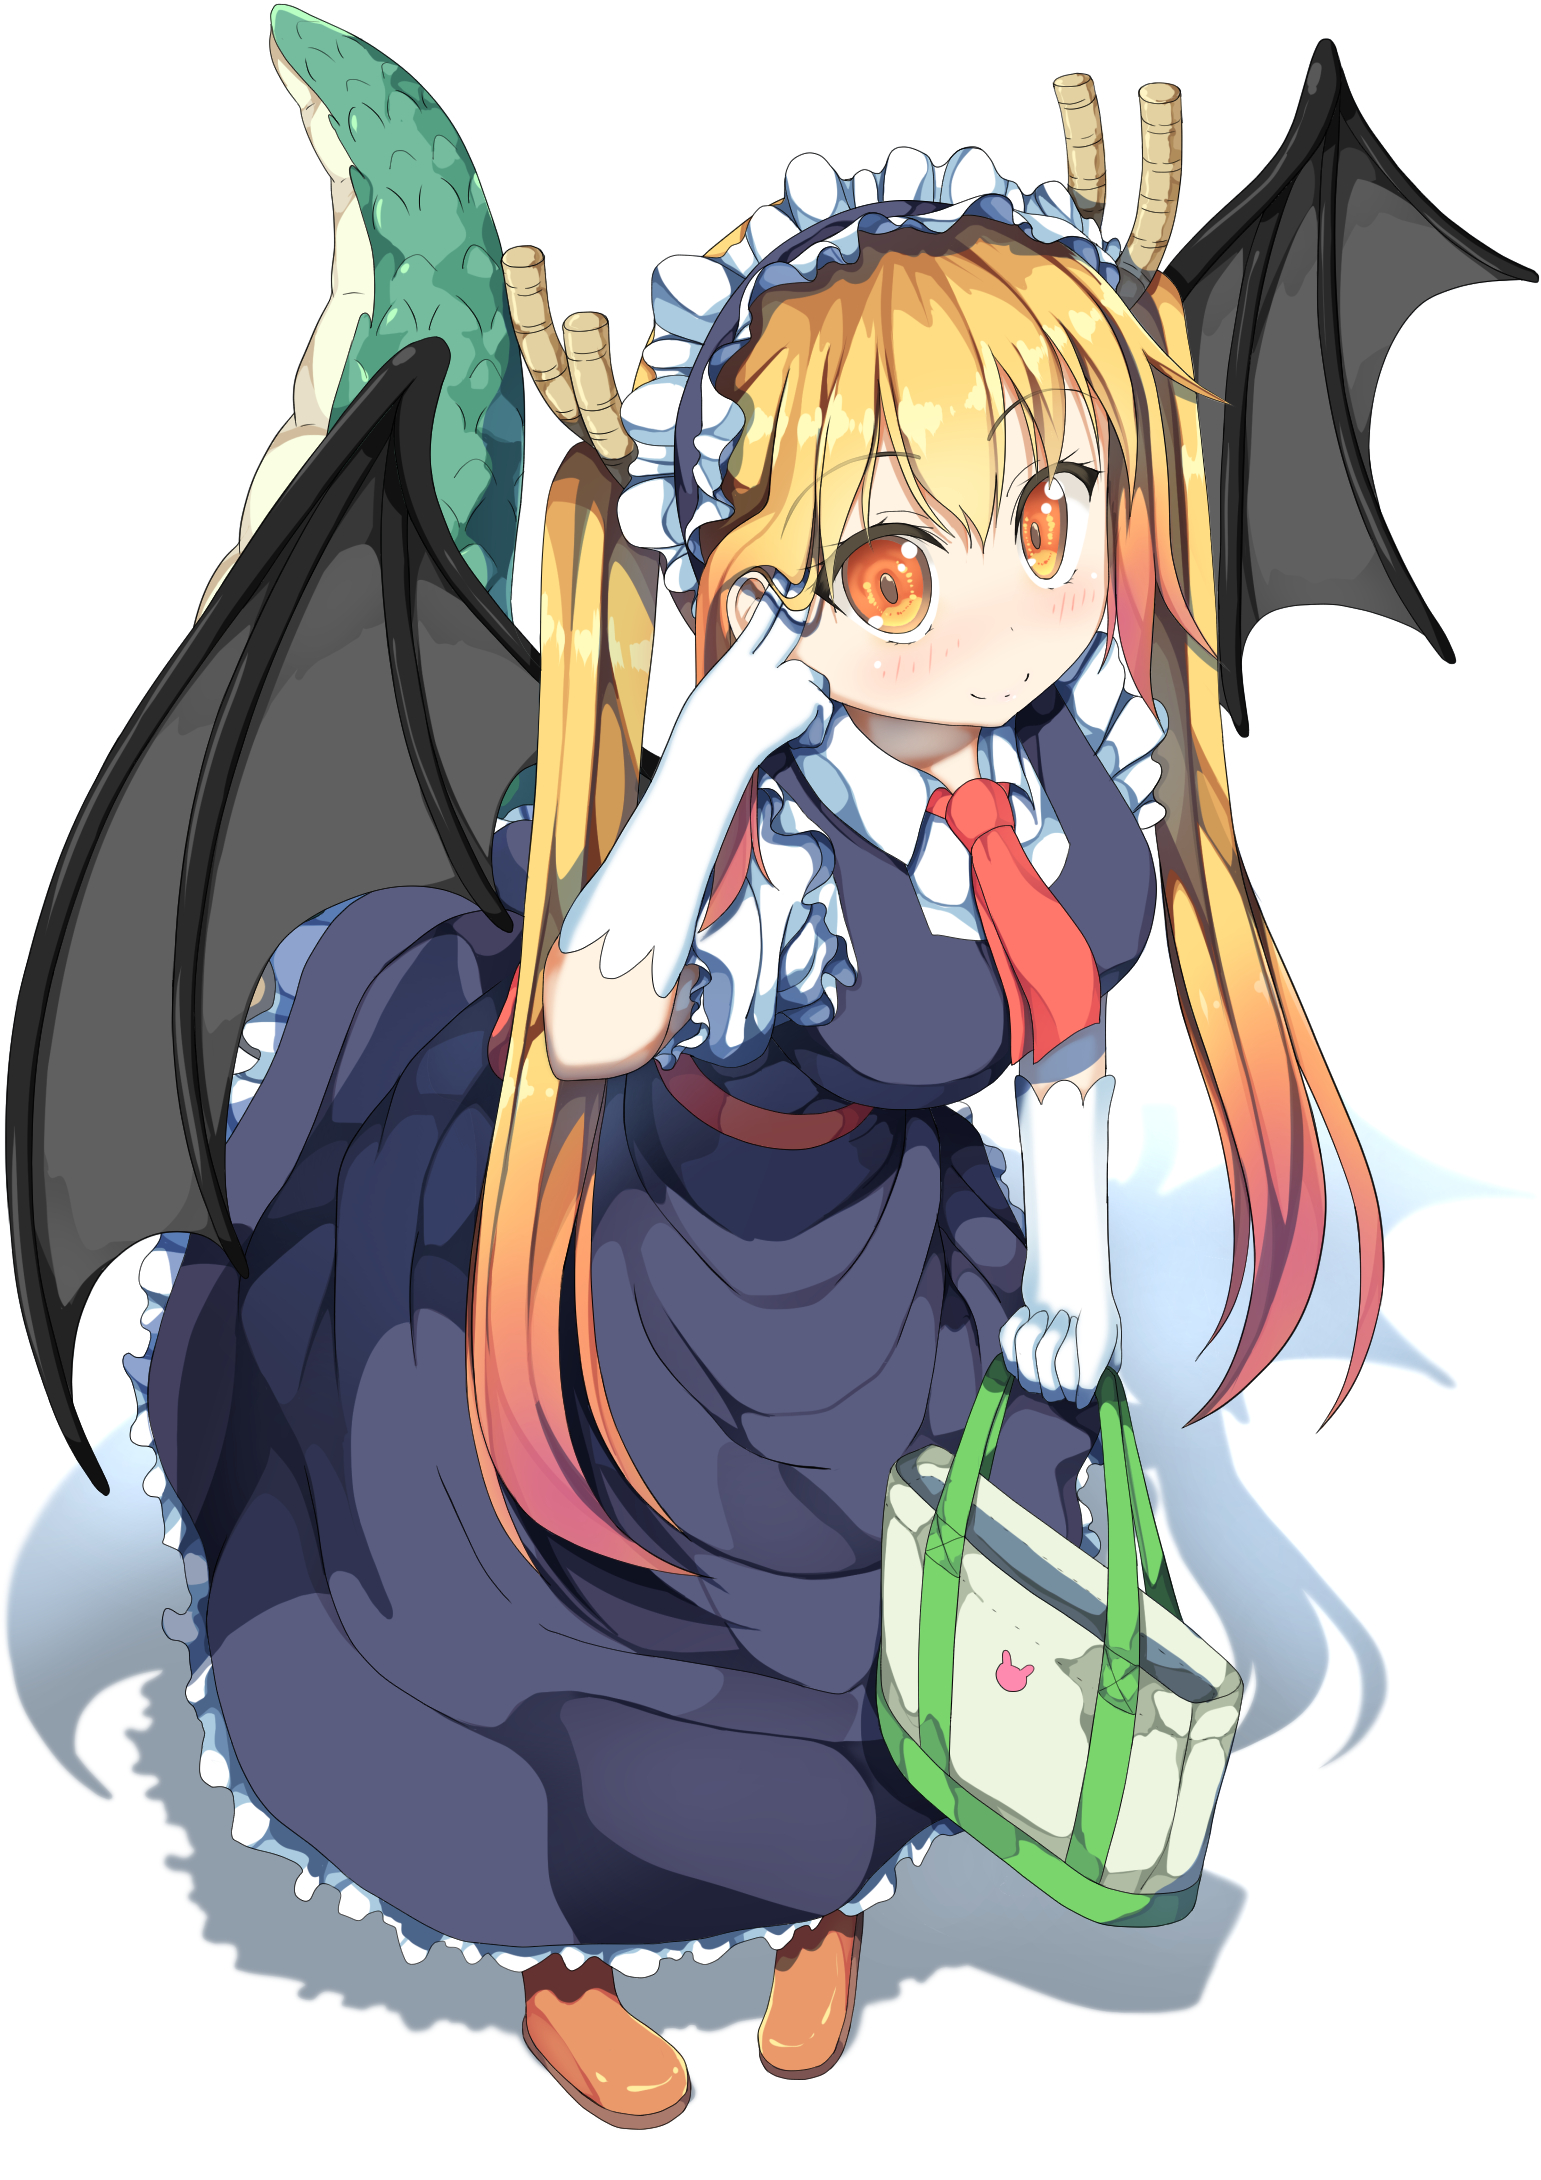 Maid dragon